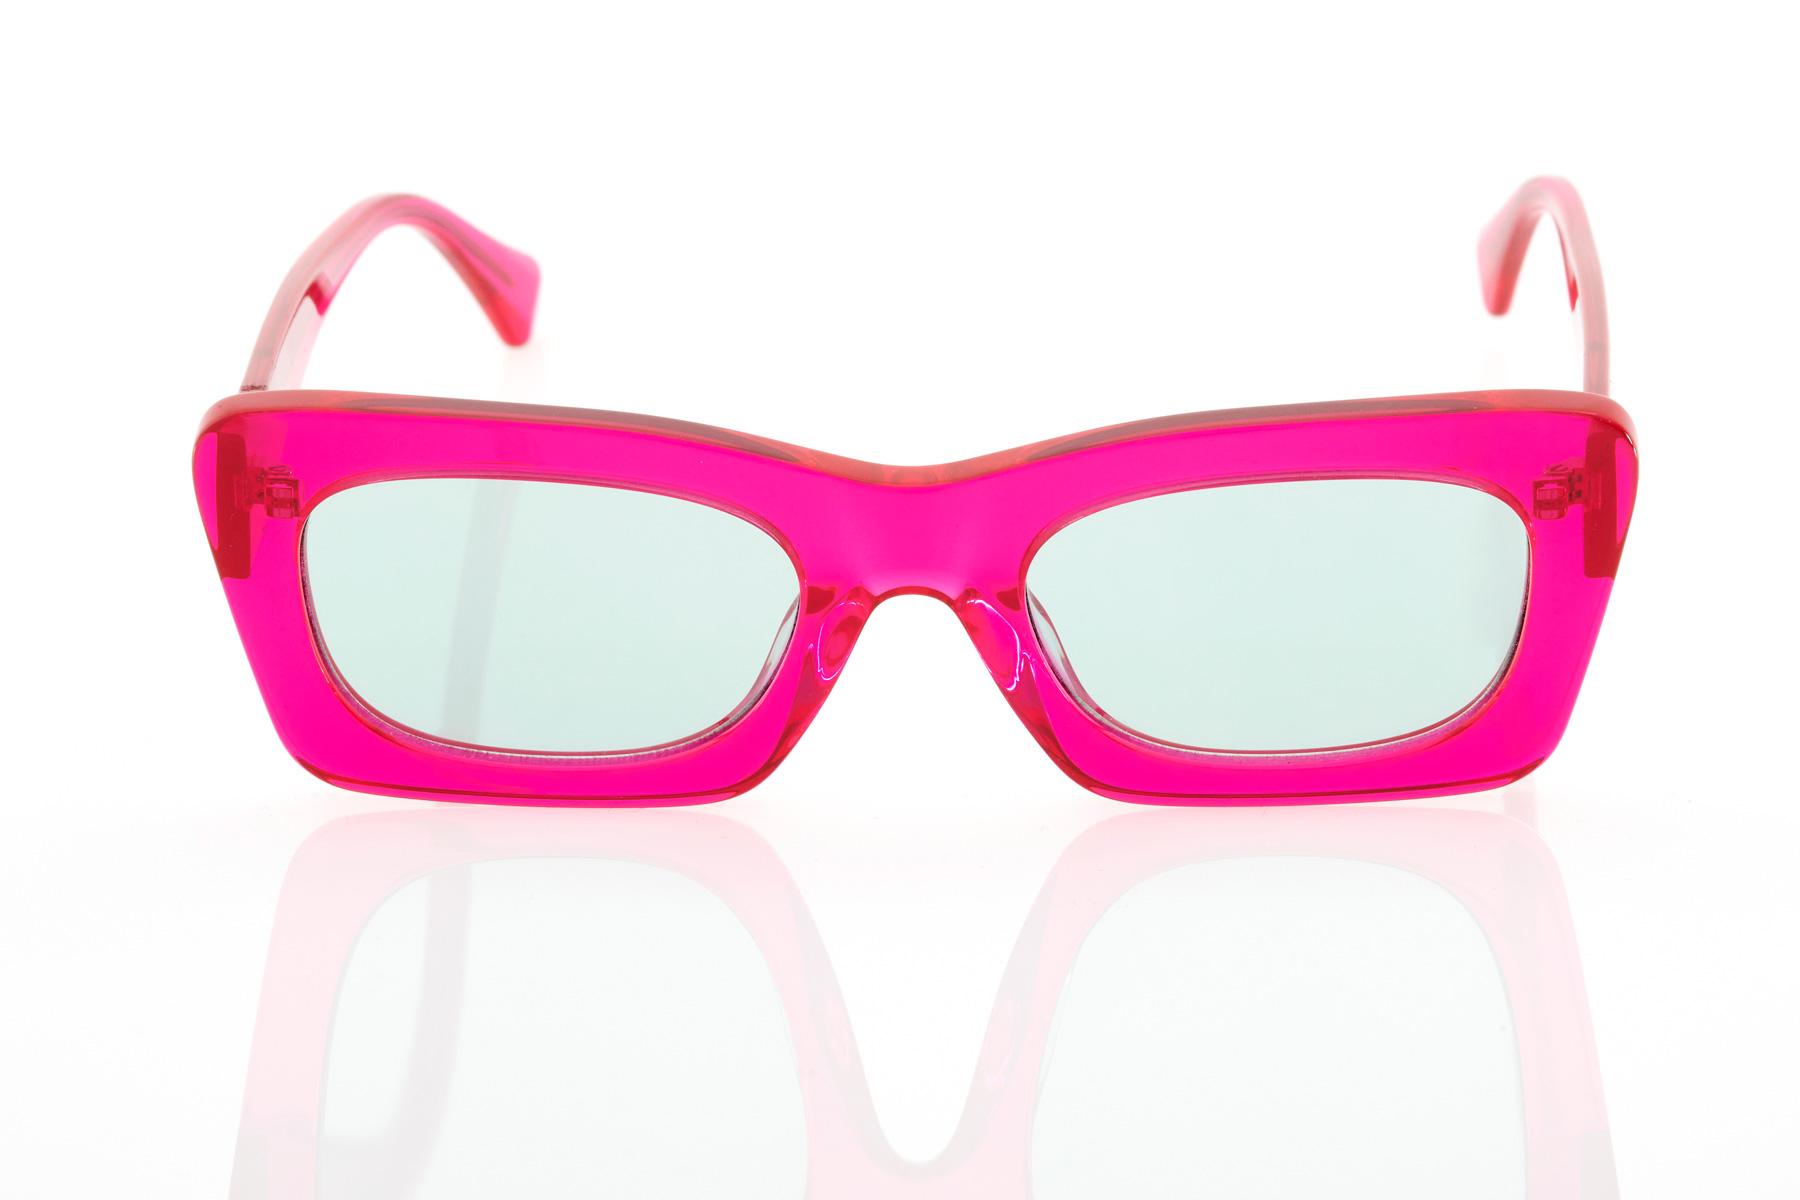 Unisex Γυαλιά Ηλίου Hawkers Fuchsia Lauper